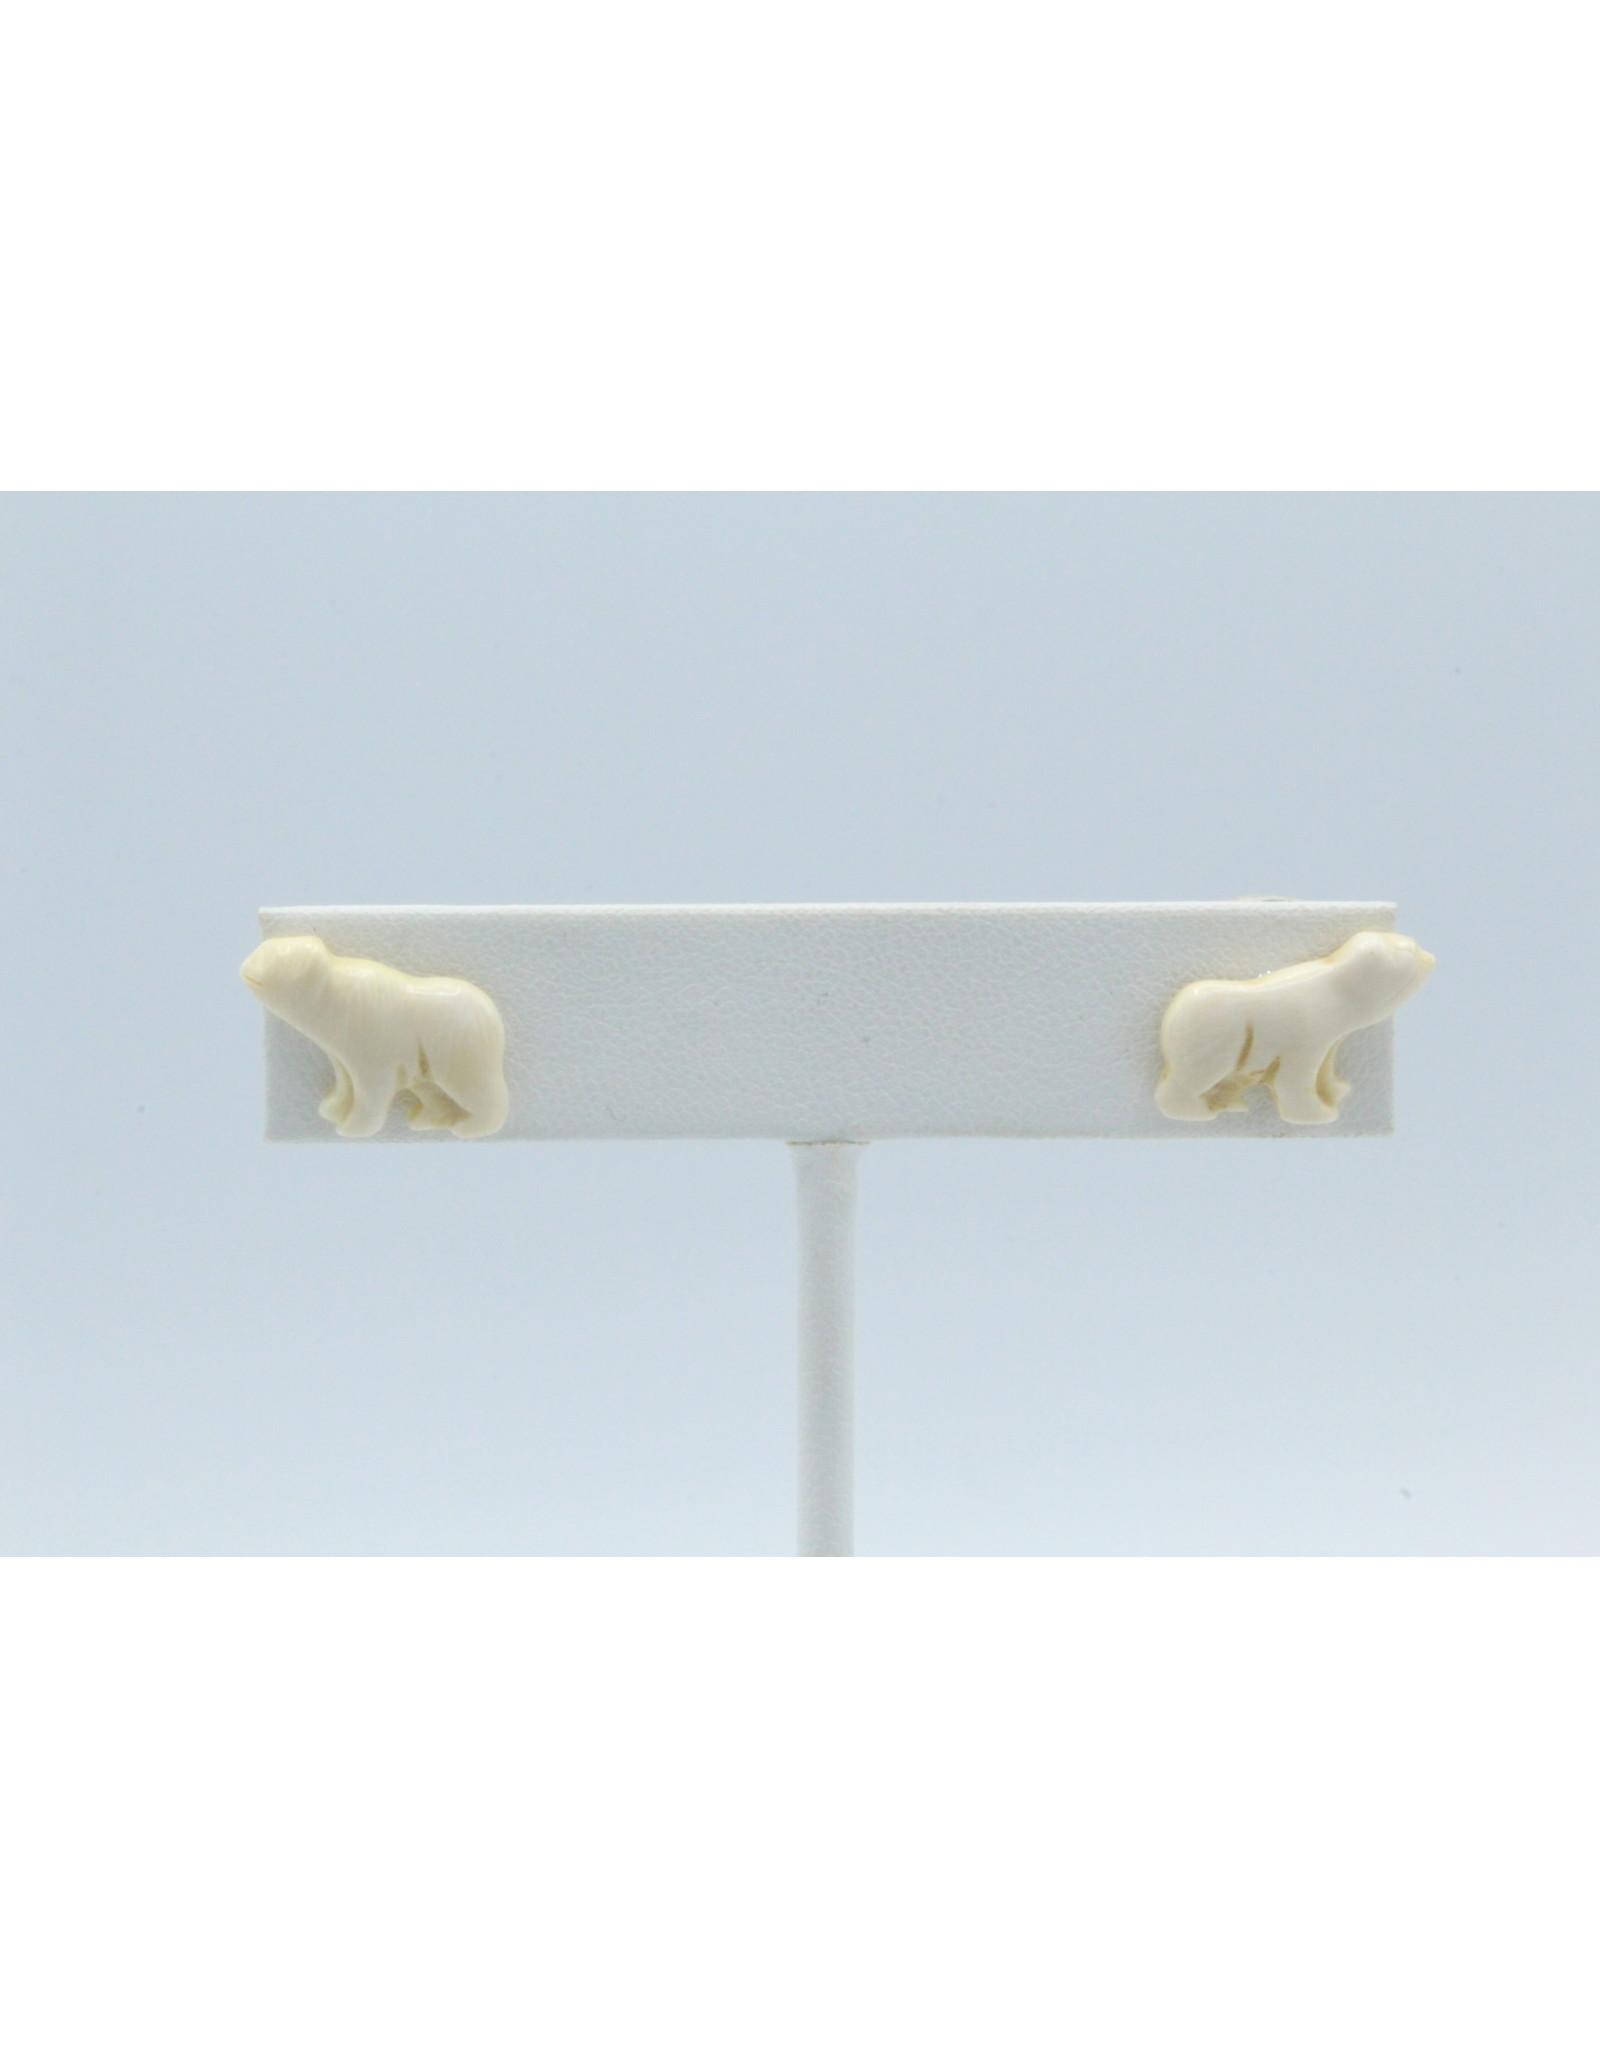 Mammoth Ivory Bear Earrings - MES52